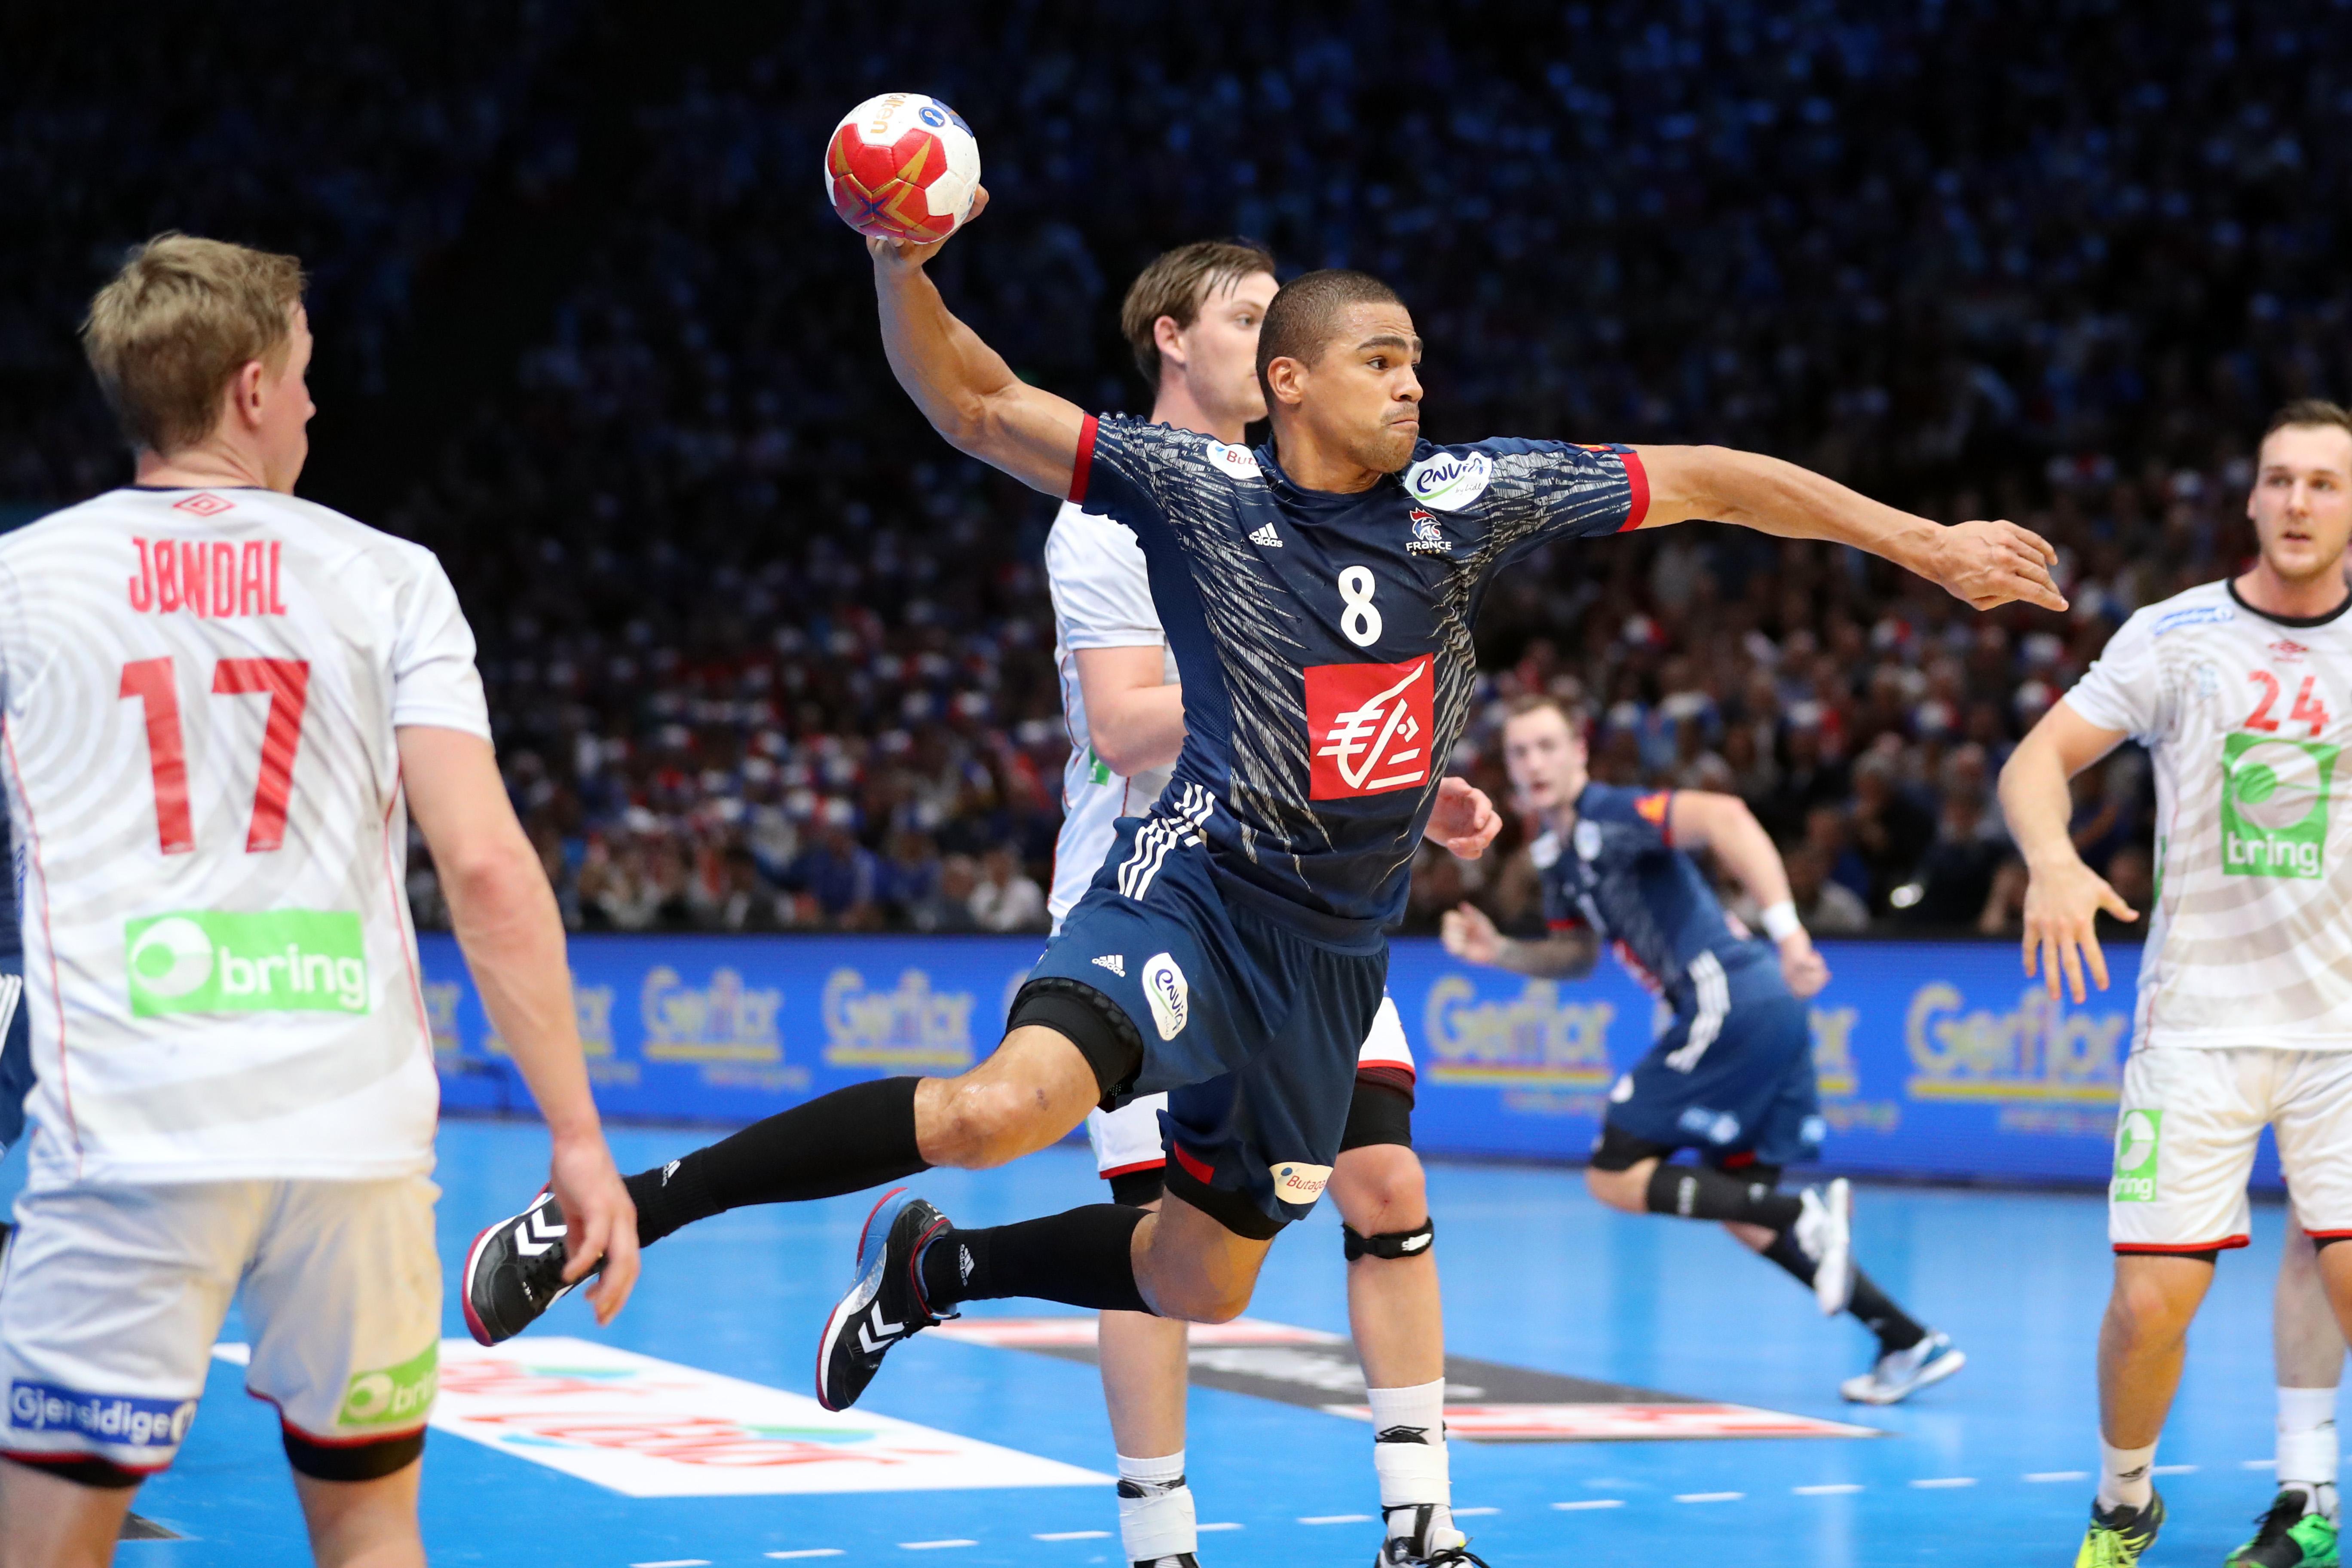 handball world cup